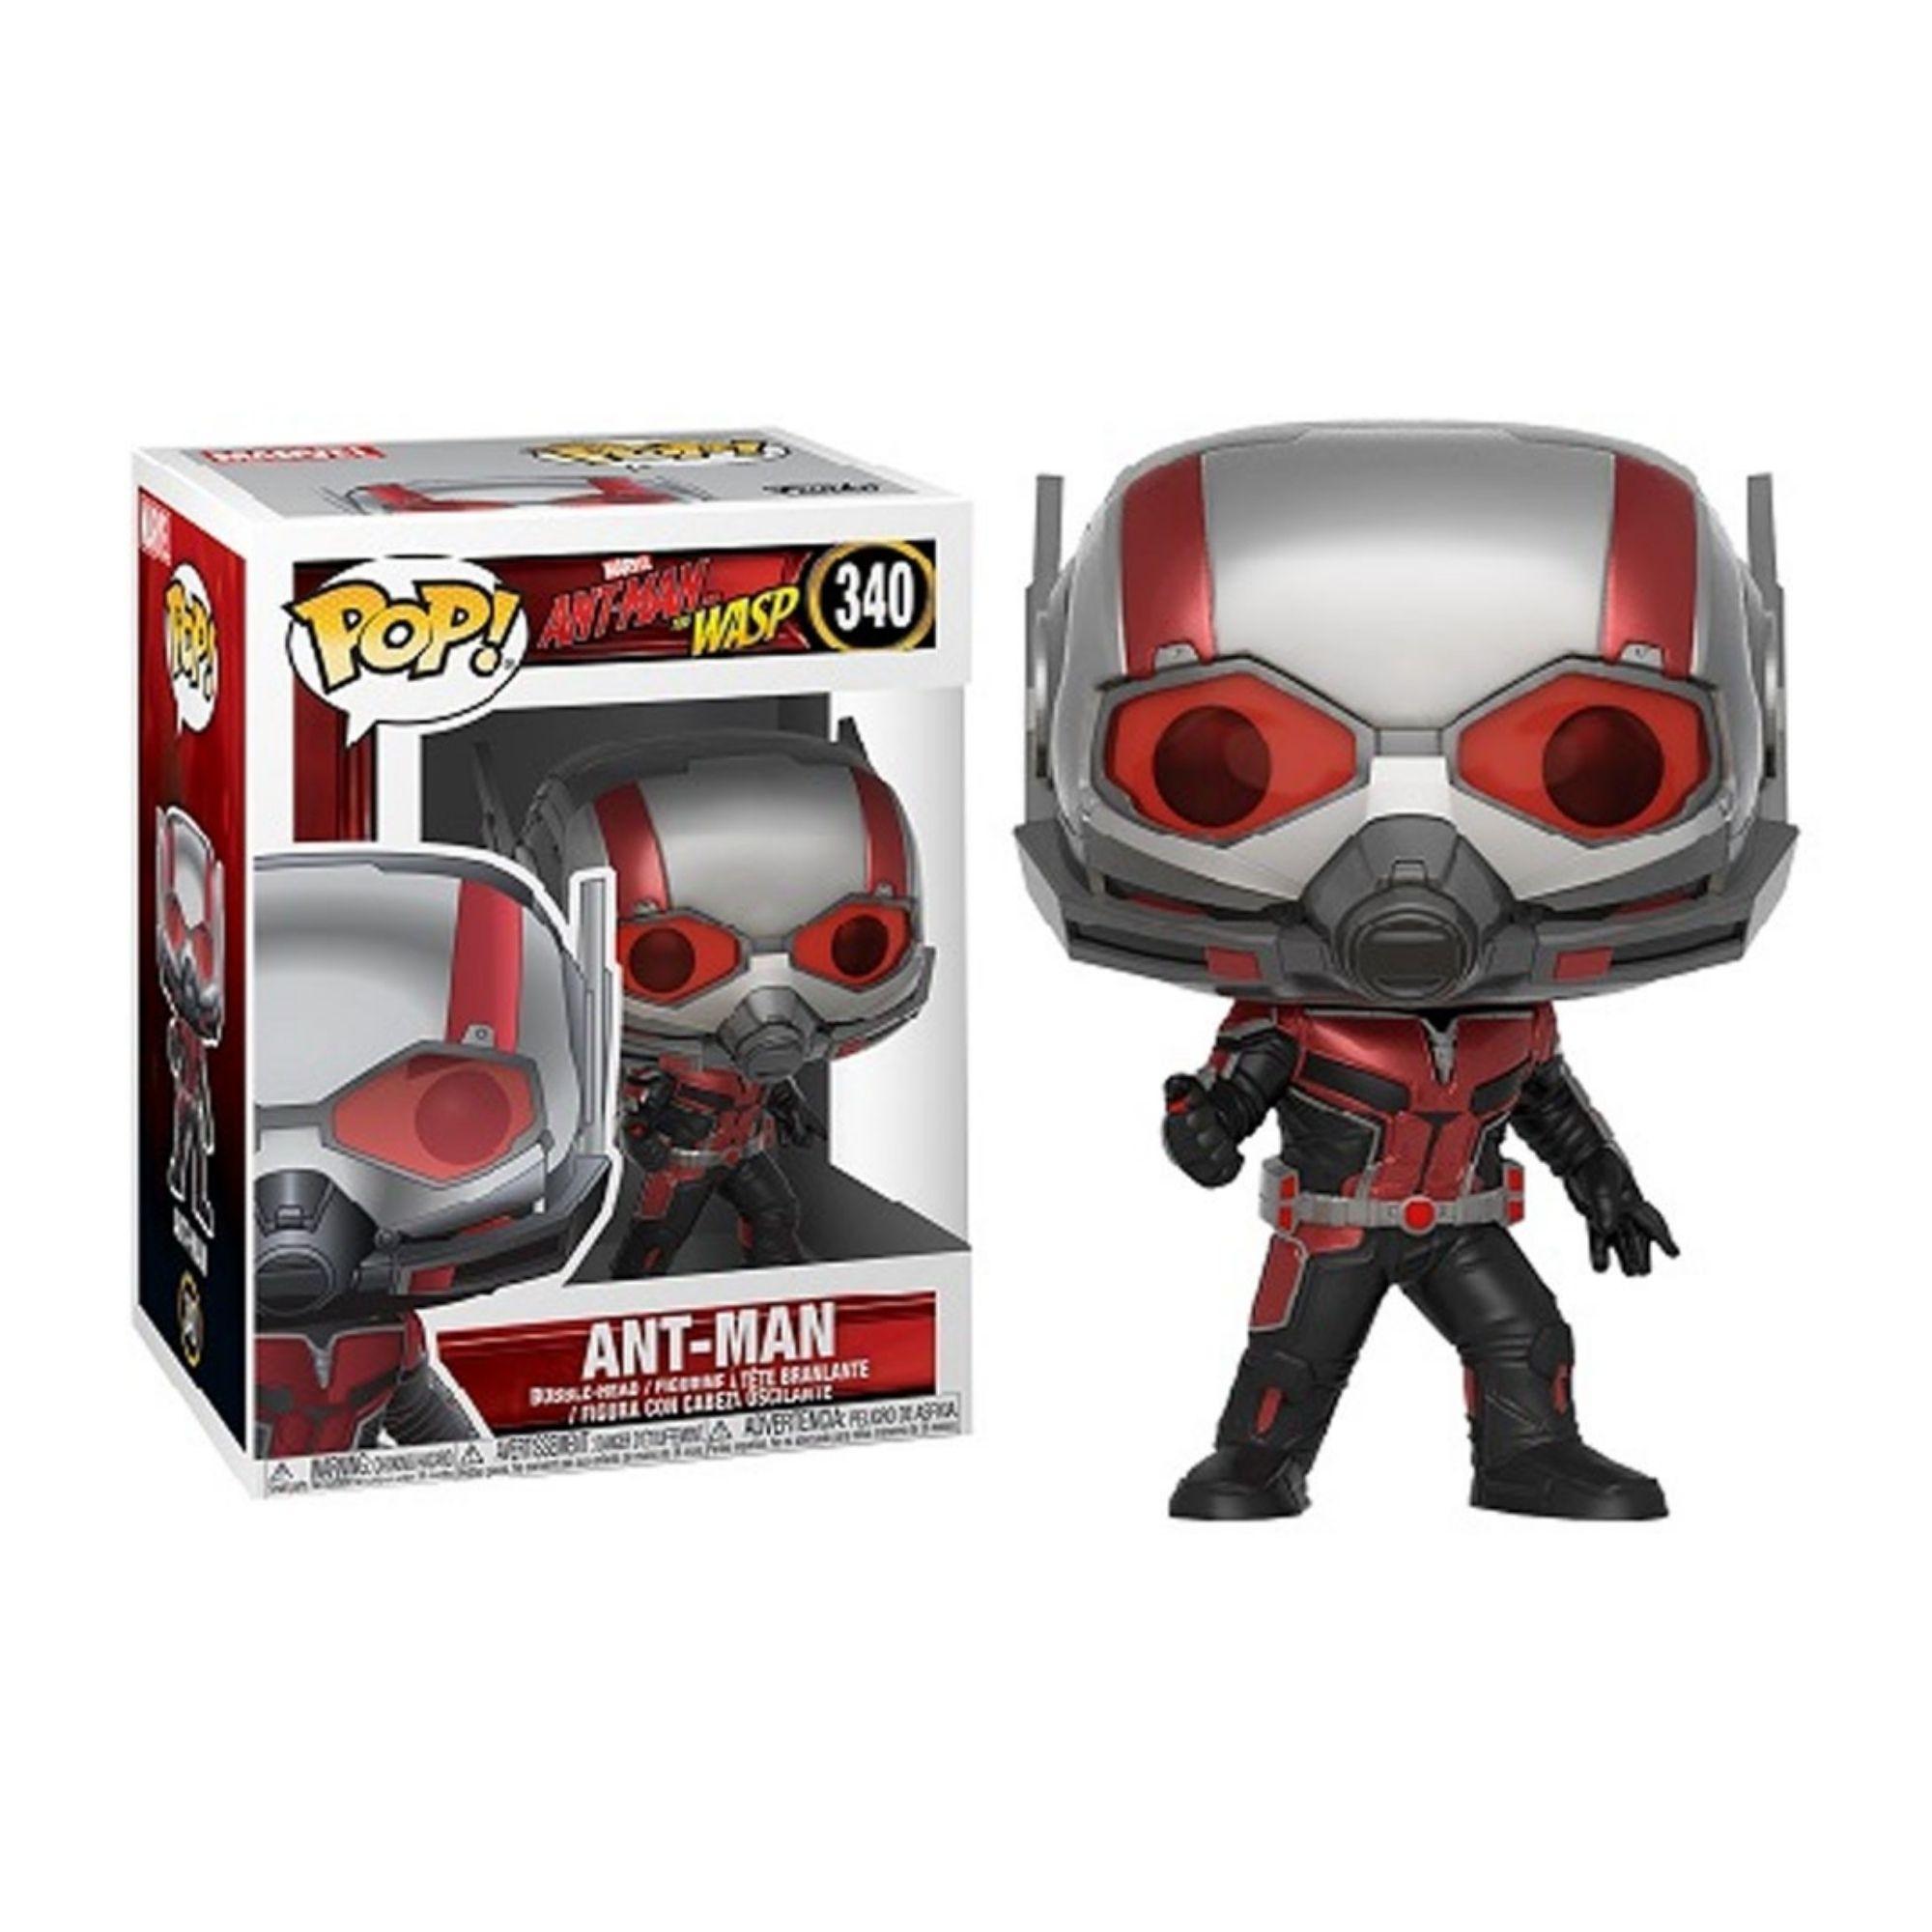 Funko Pop Marvel Ant-Man Homem Formiga #340  - Game Land Brinquedos